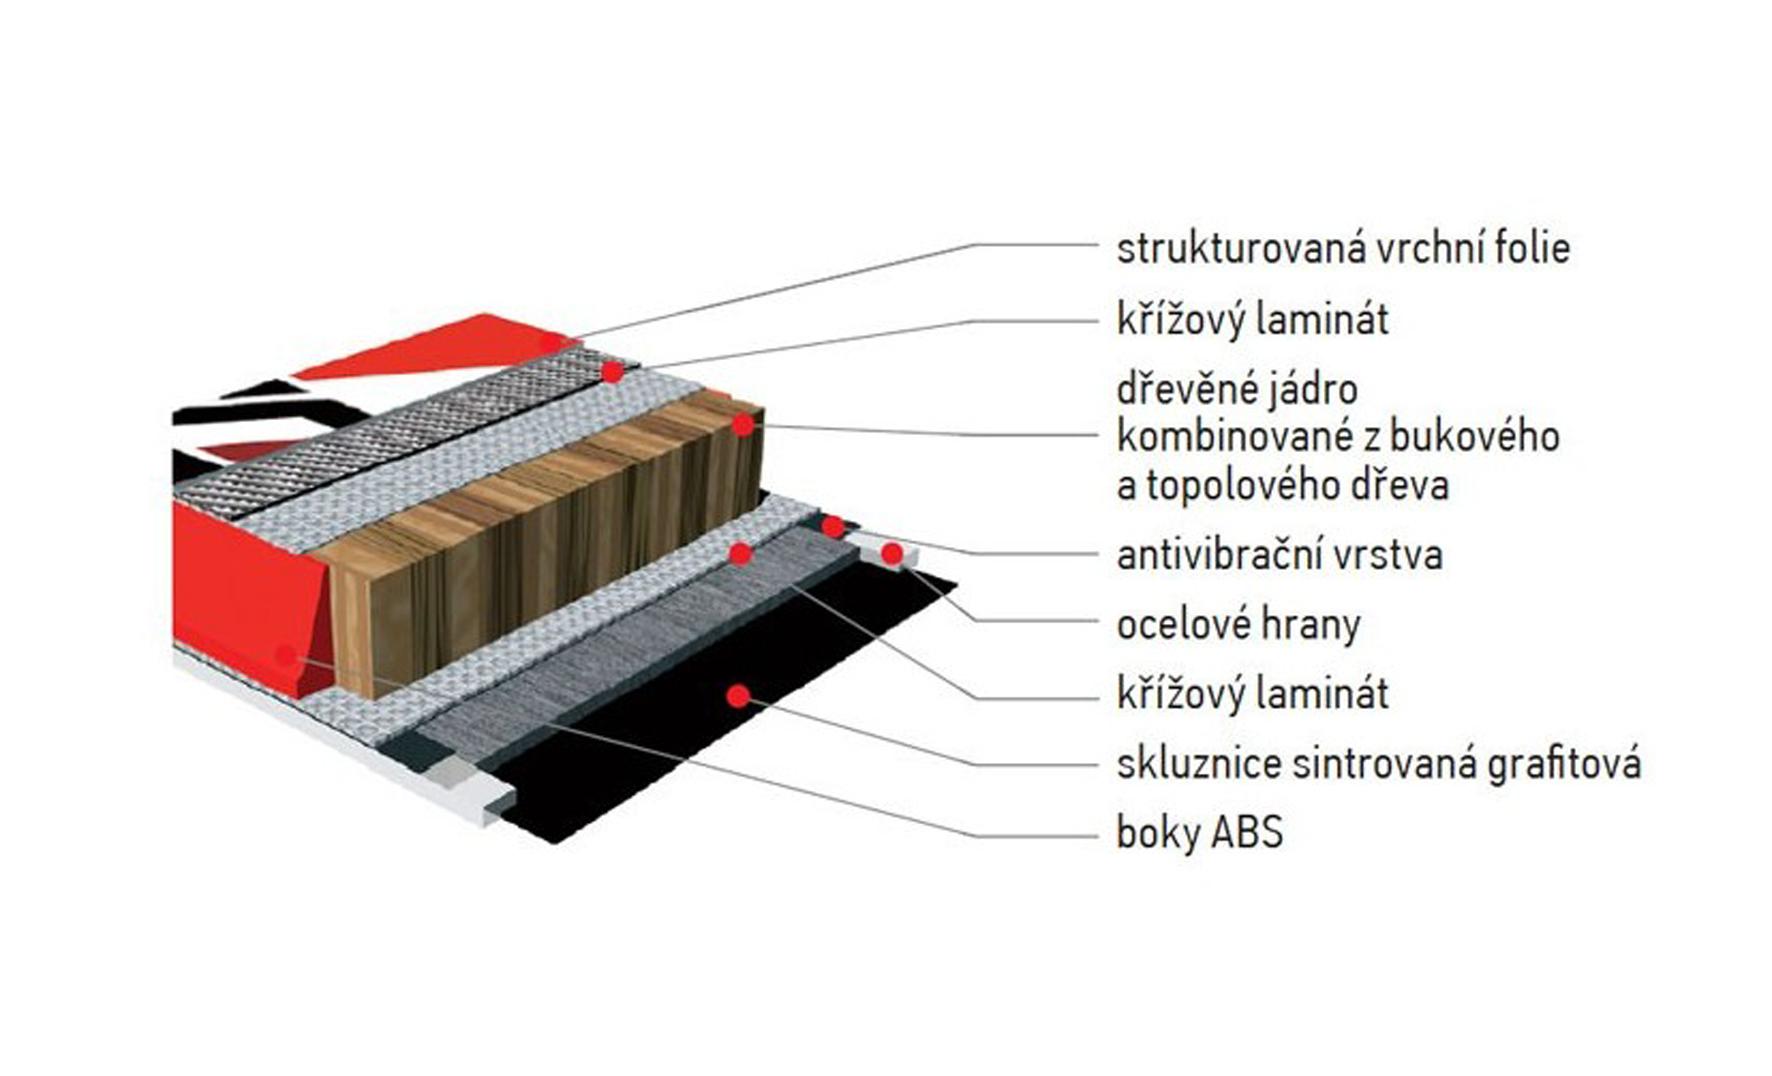 3) sporten-ahv-rc-tyrolia-power-11d